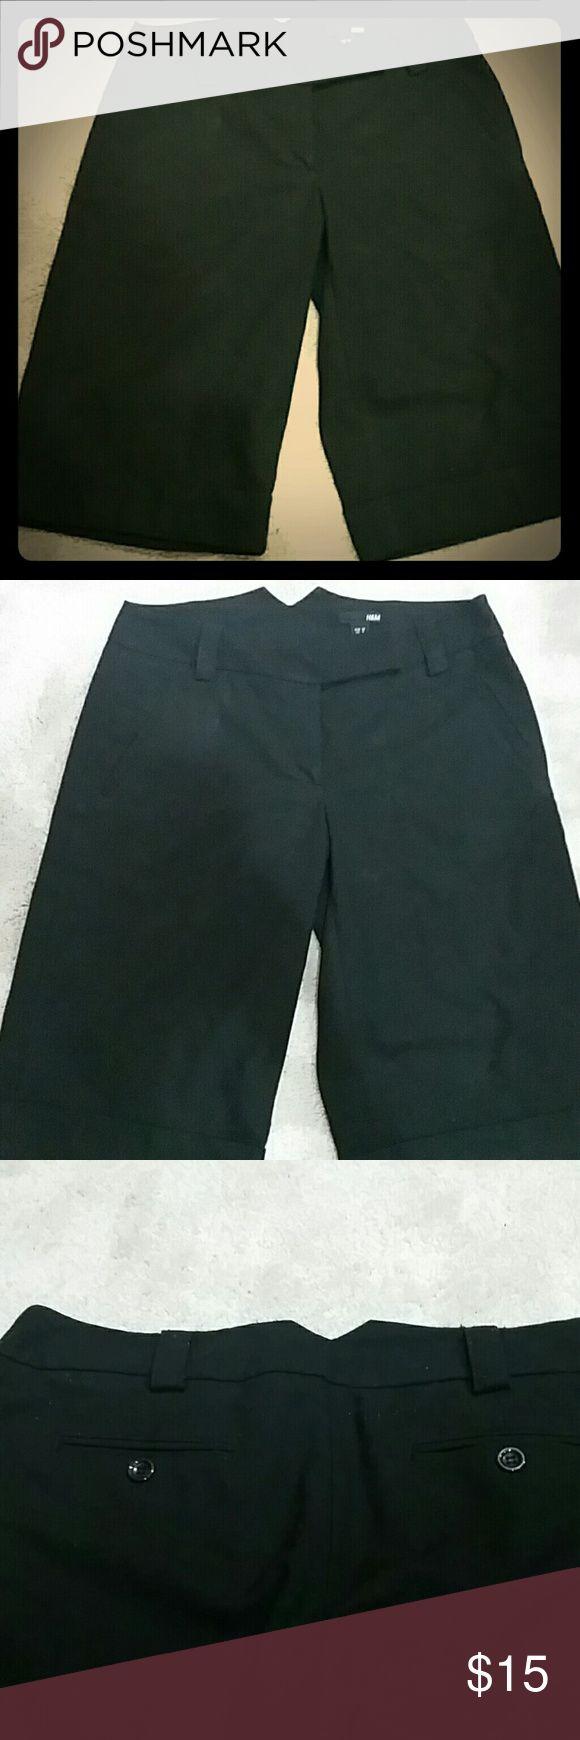 H&M womens knee length dress pants Black H&M womens knee length dress pants in size 8 true to size... H&M Pants Capris